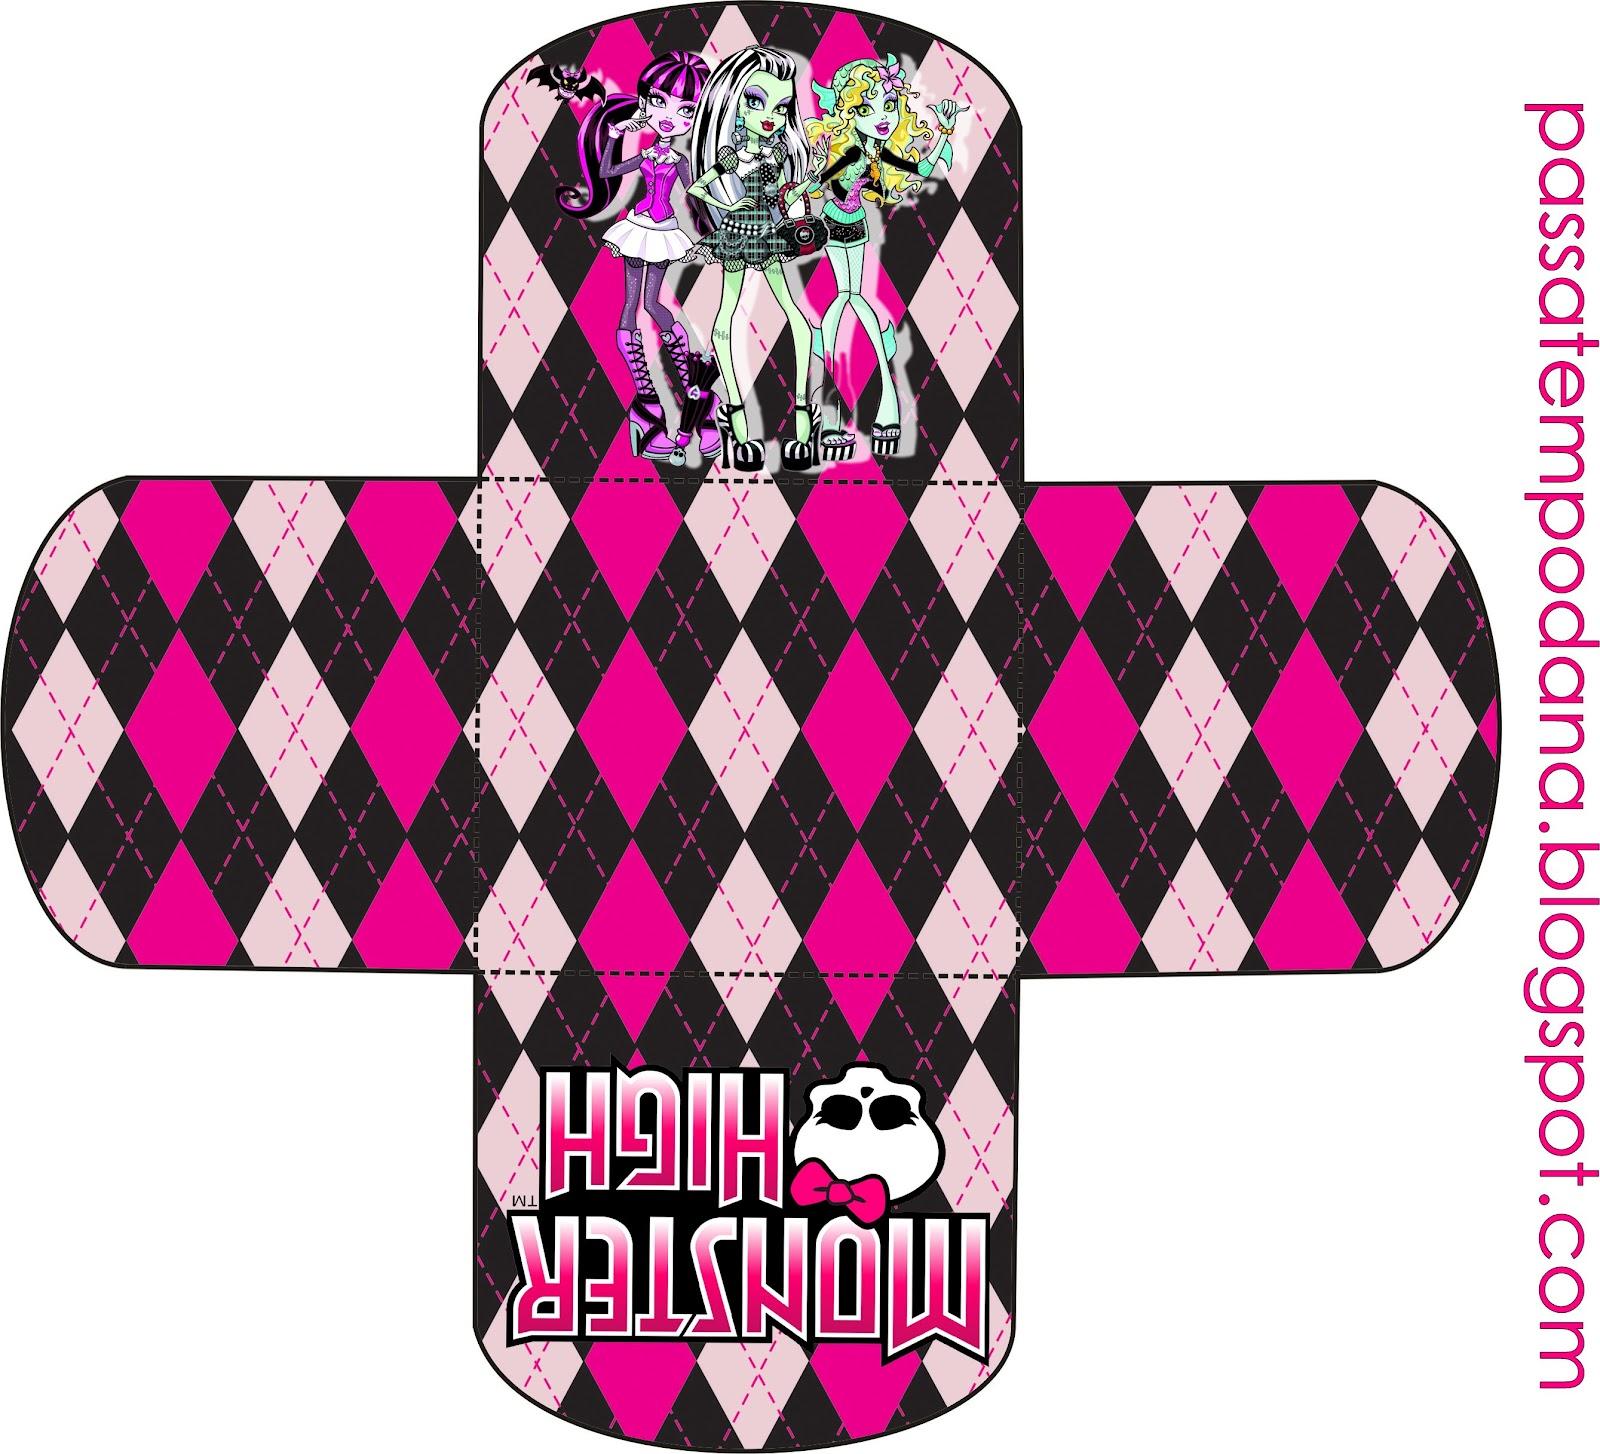 http://passatempodana.blogspot.com/2012/06/kit-monster-high-pink-e-preto.html